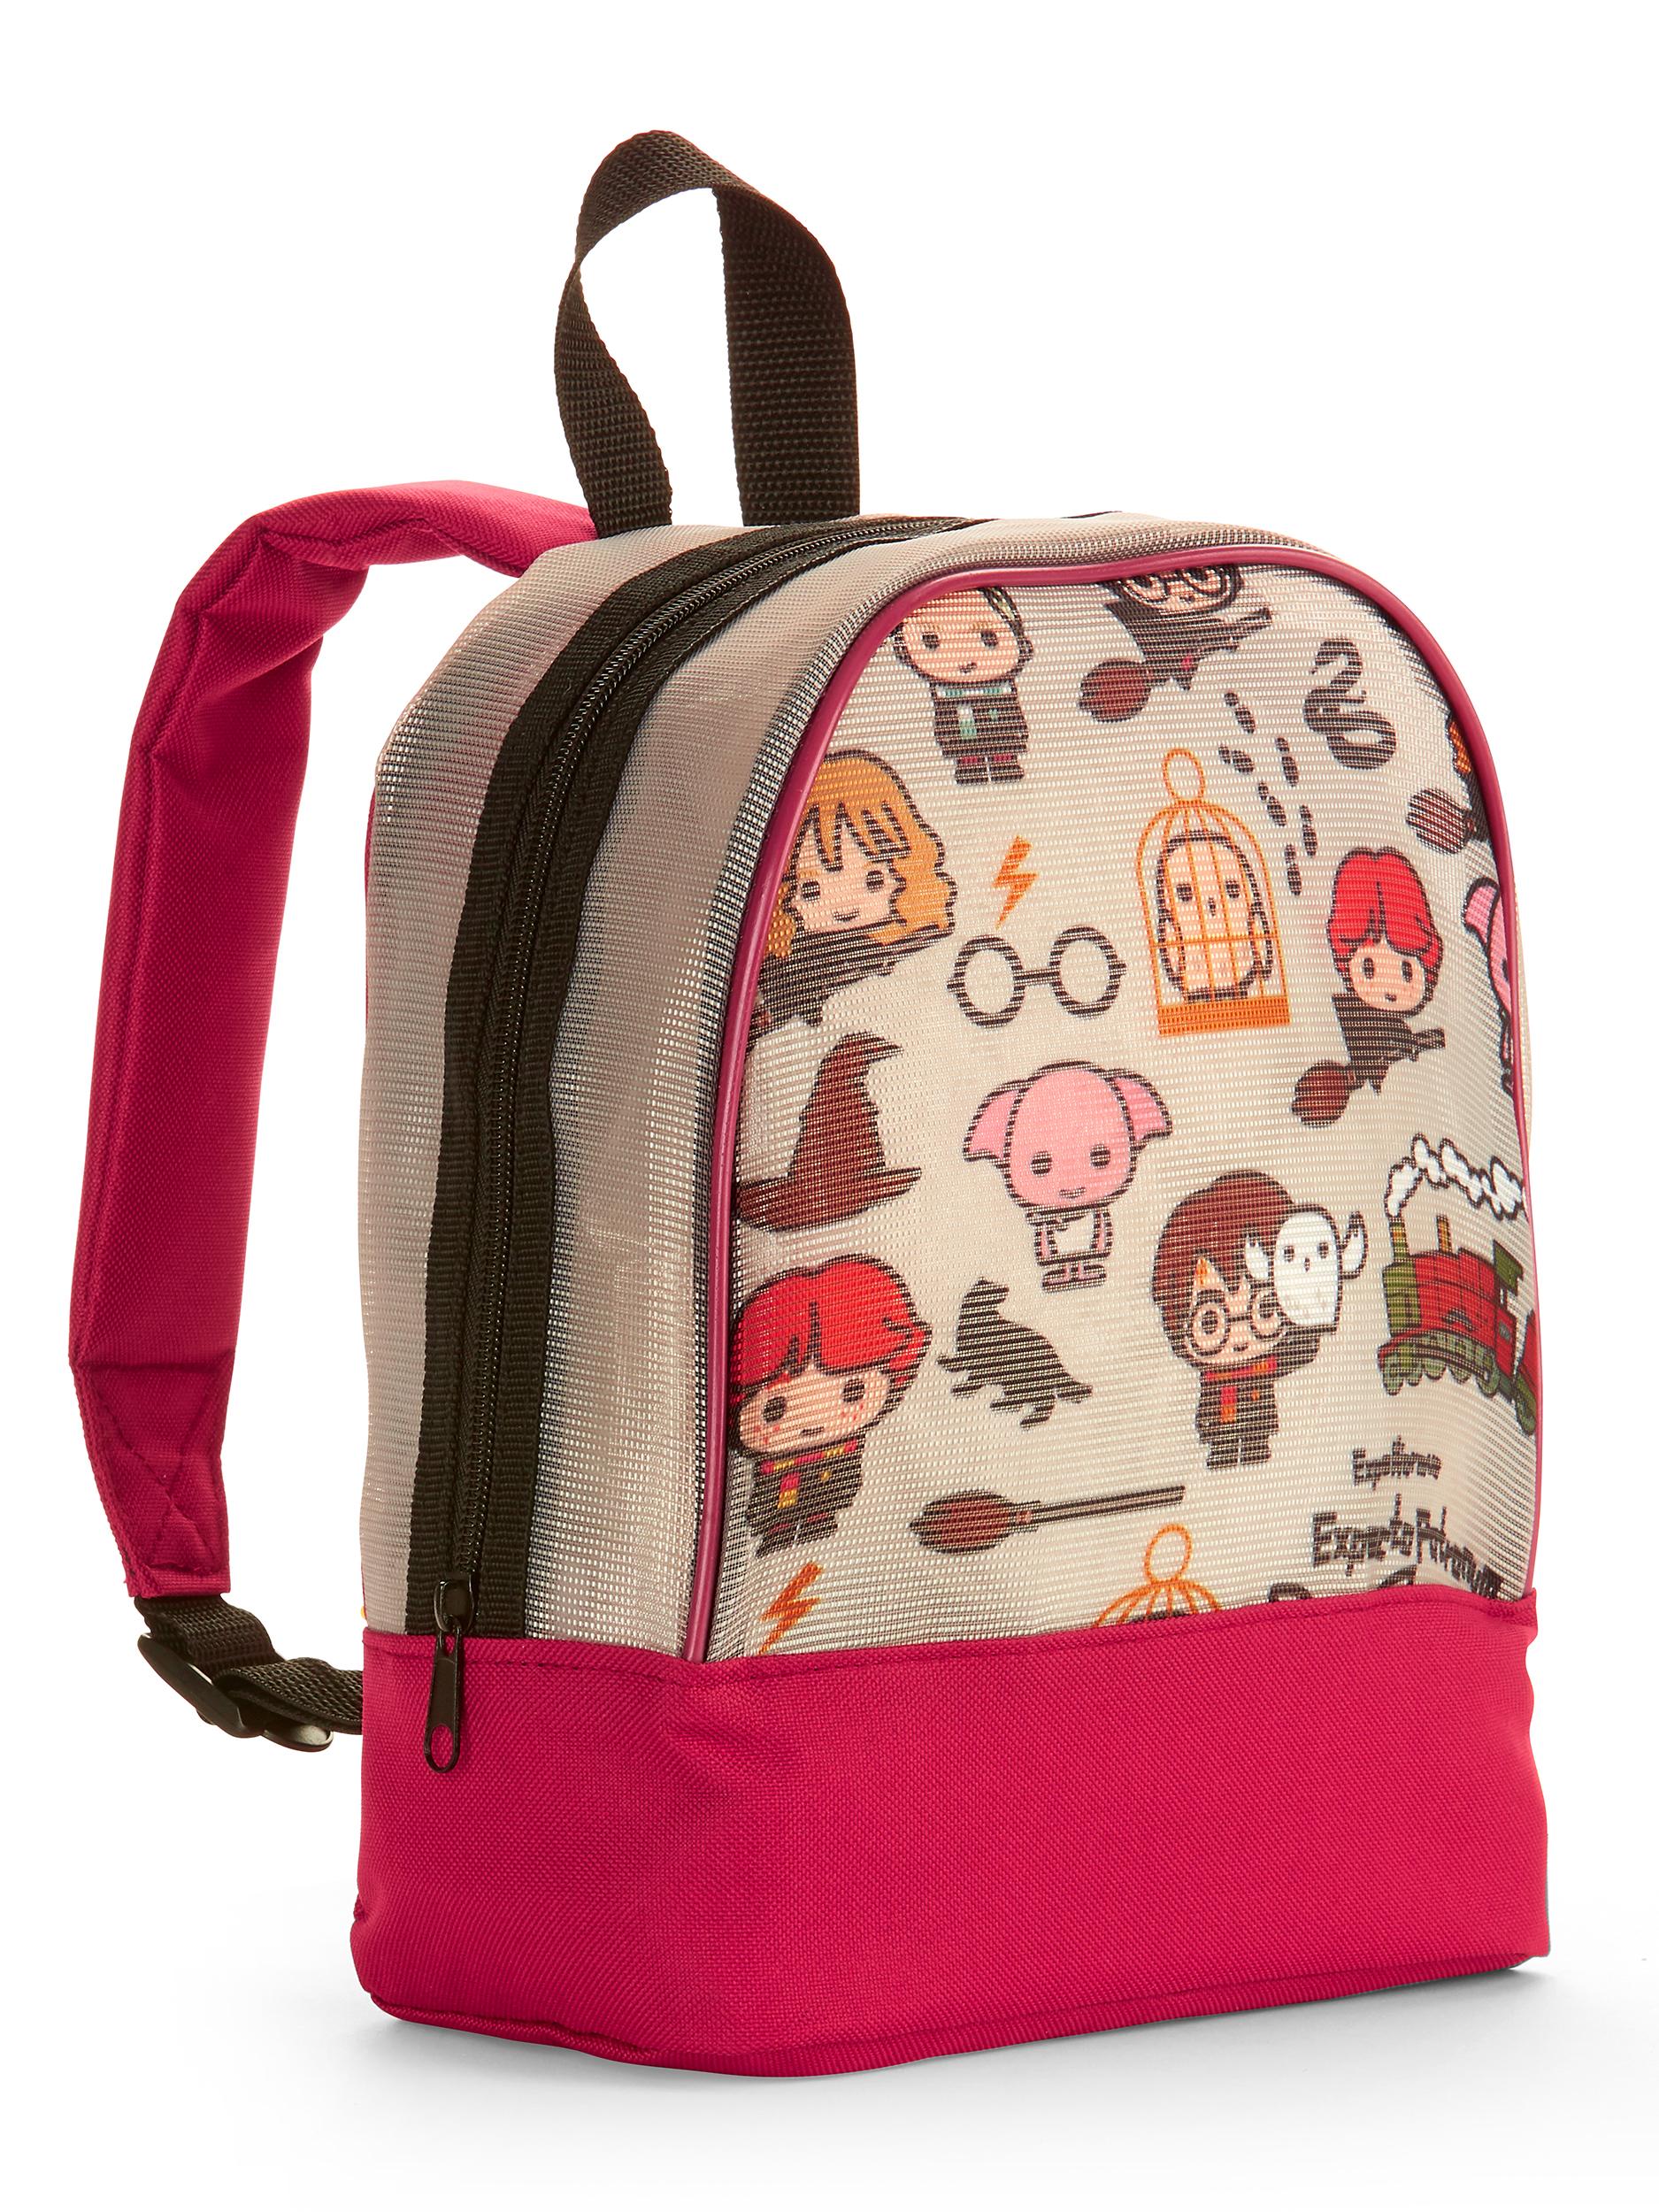 Chibi Style Harry Potter Characters Mesh Mini Backpack